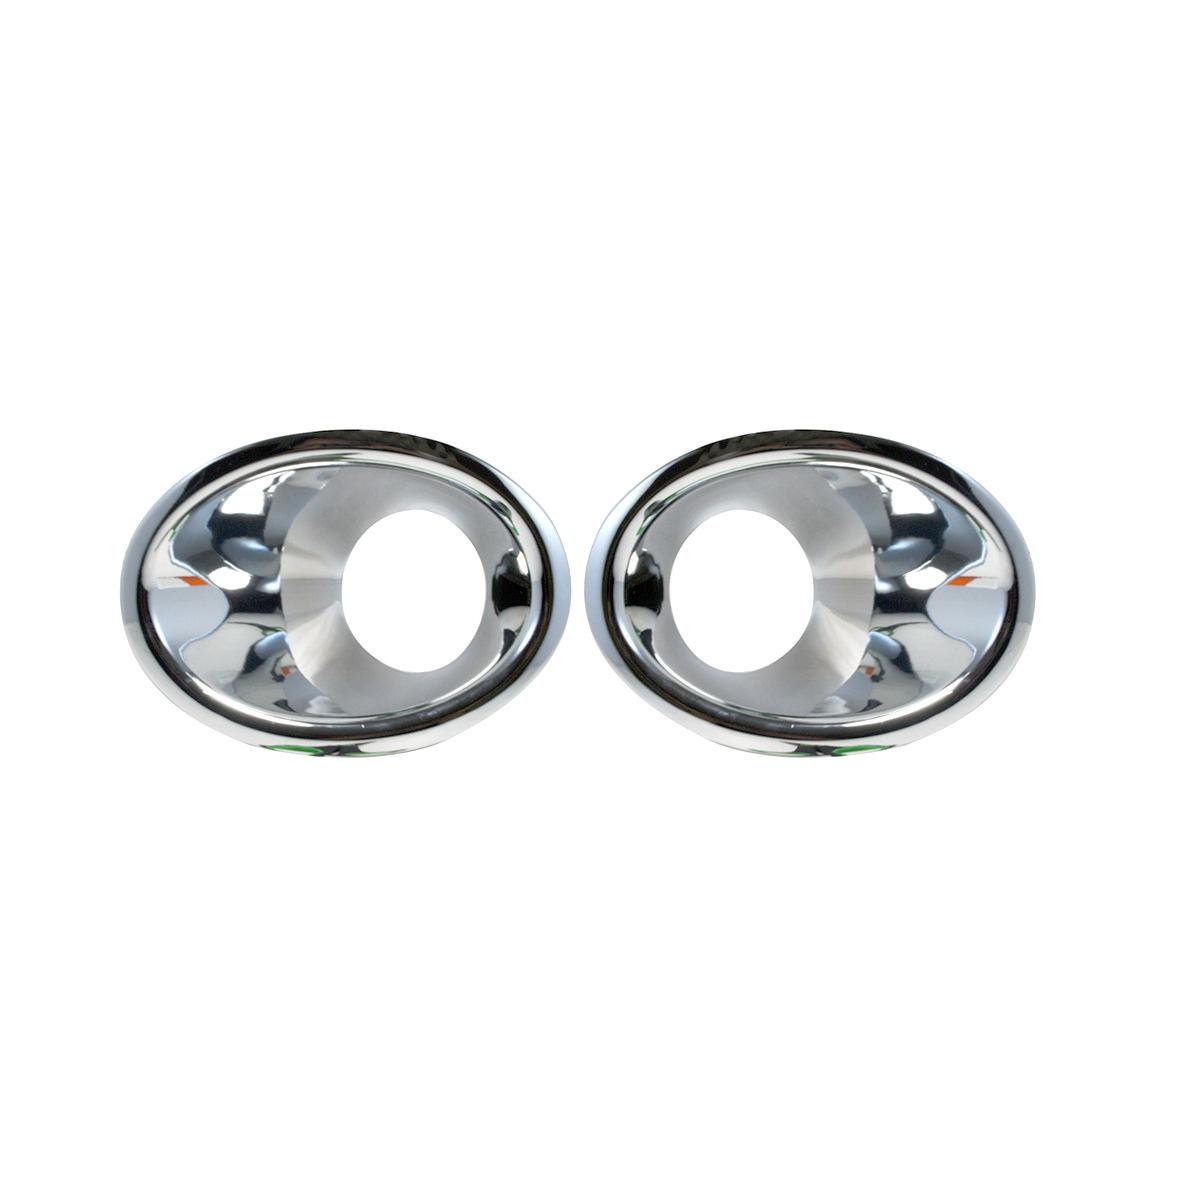 Autofriend Ring Fog Lamp Nissan Evalia 2014 Pelindung Variasi Aksesoris Mobil Modifikasi - AI-CBB3067